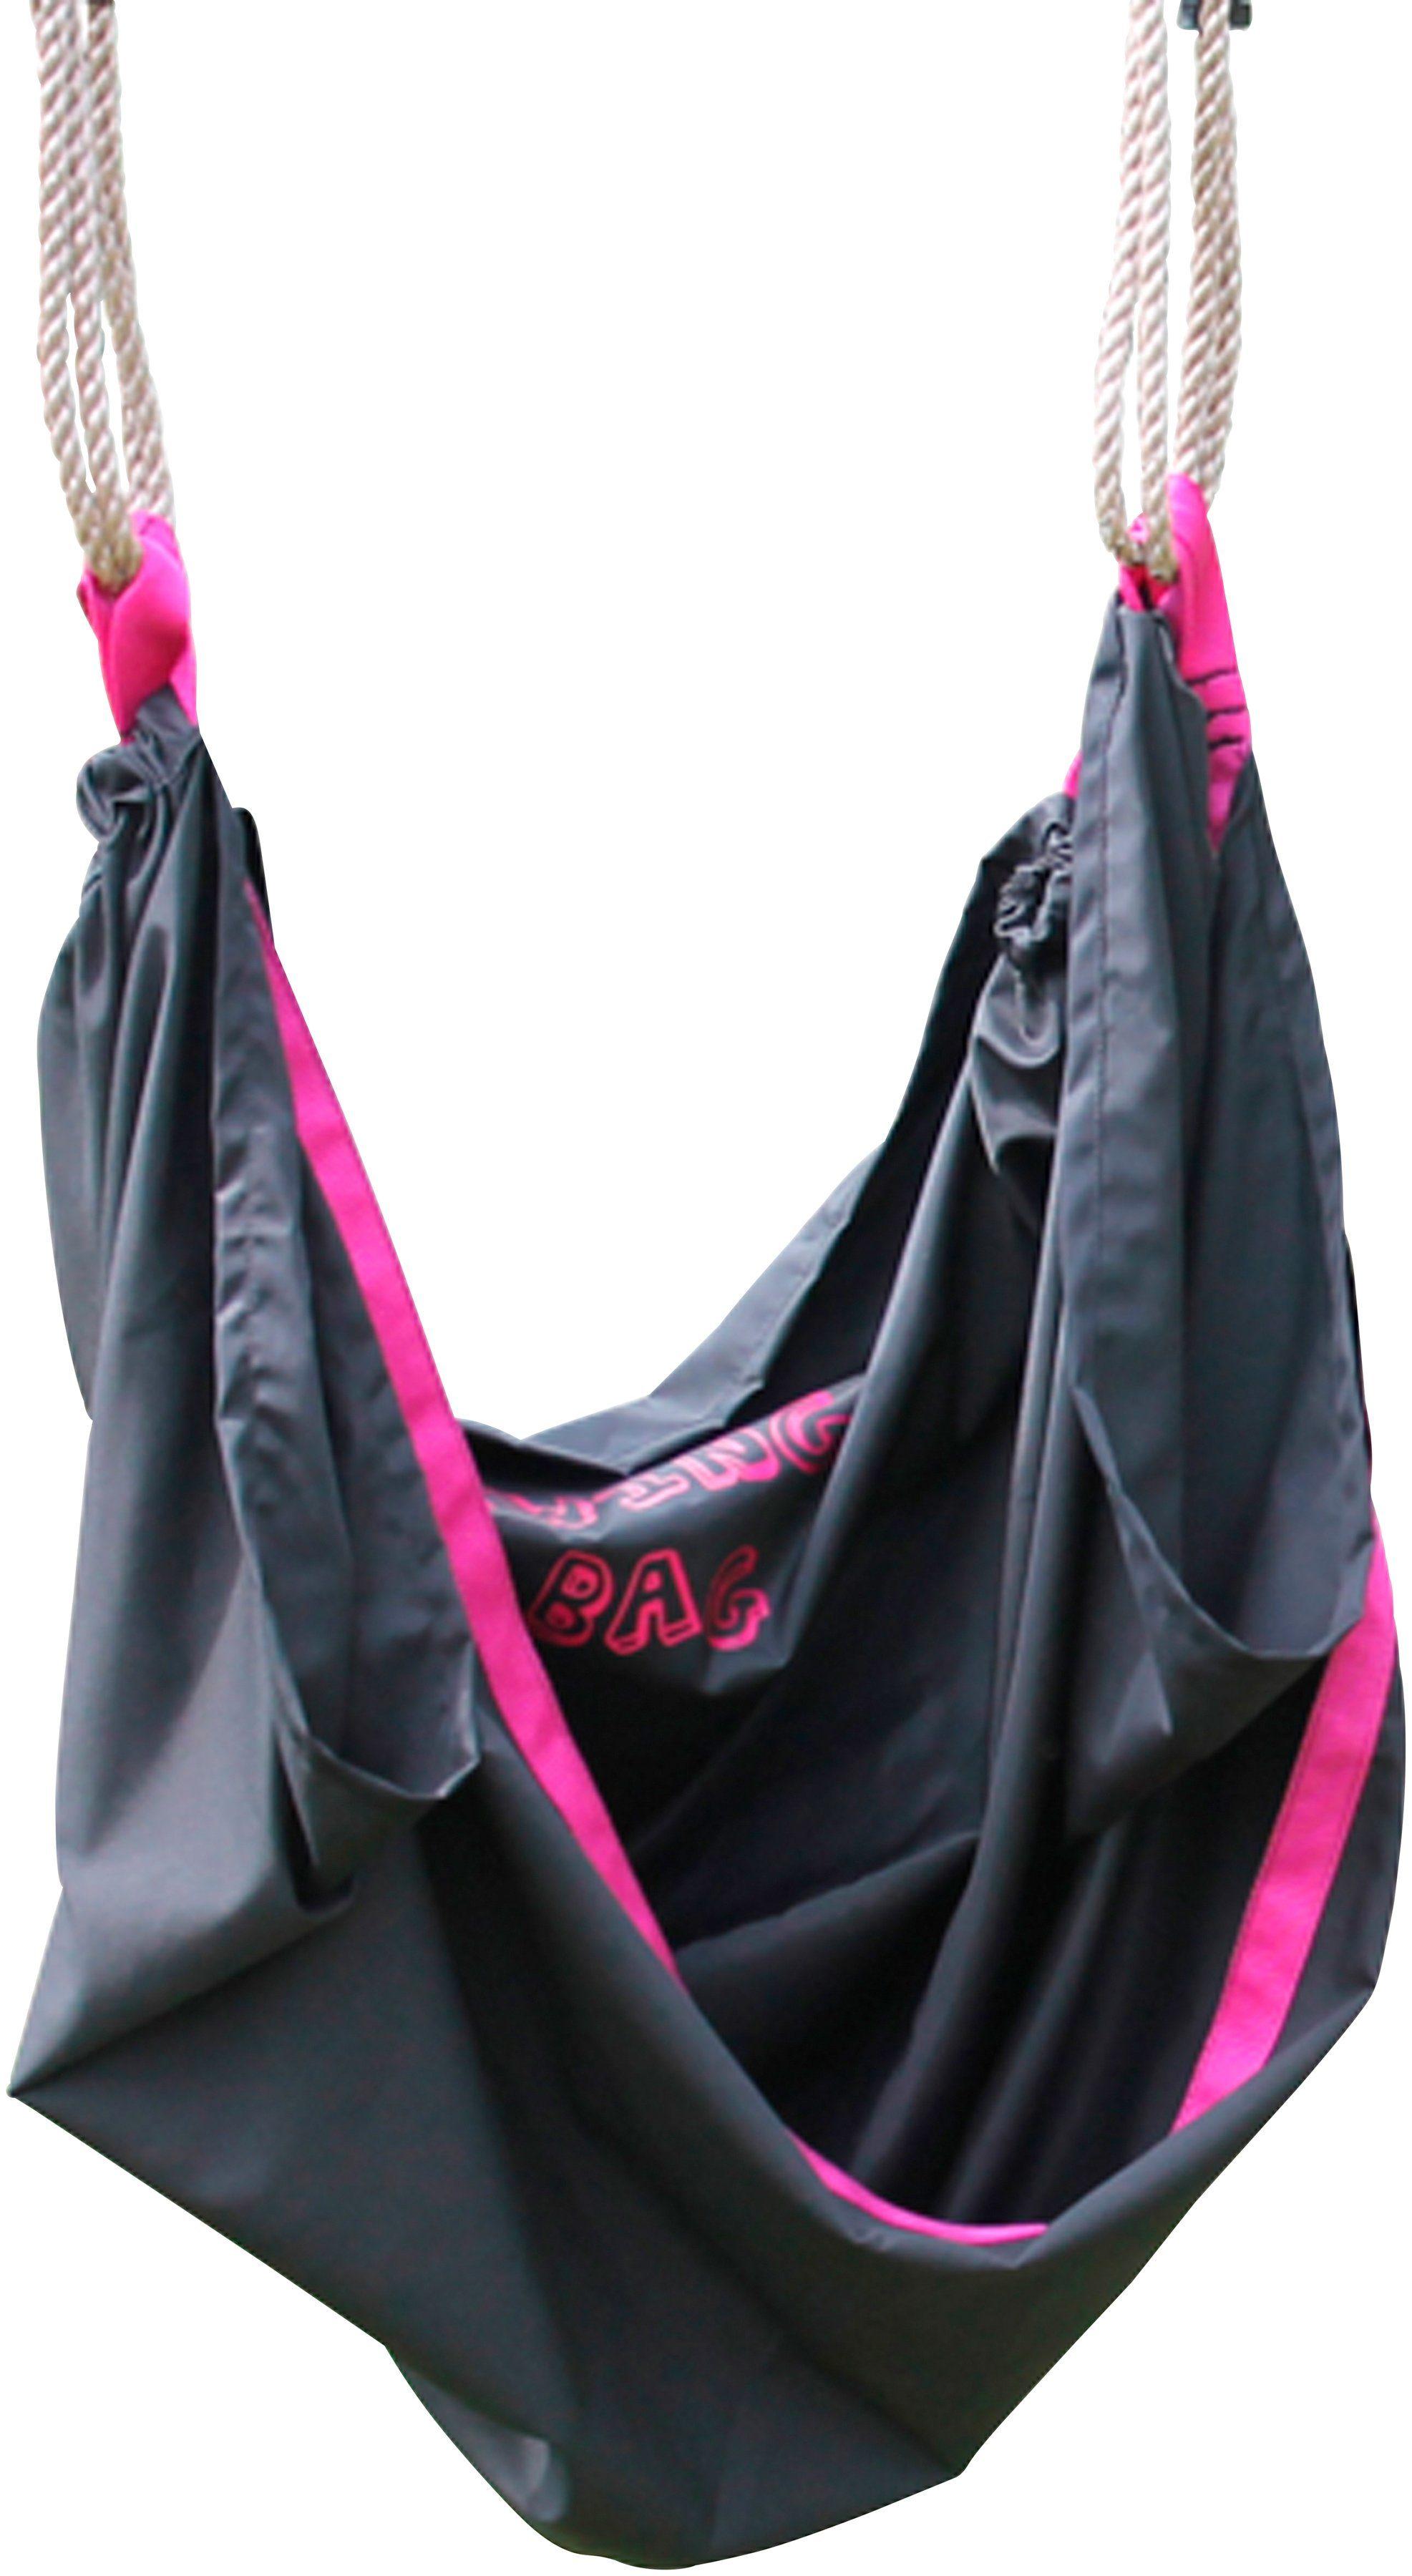 EXIT Schaukelsitz »Swingbag«, Textil, 110 cm, schwarz/rosa